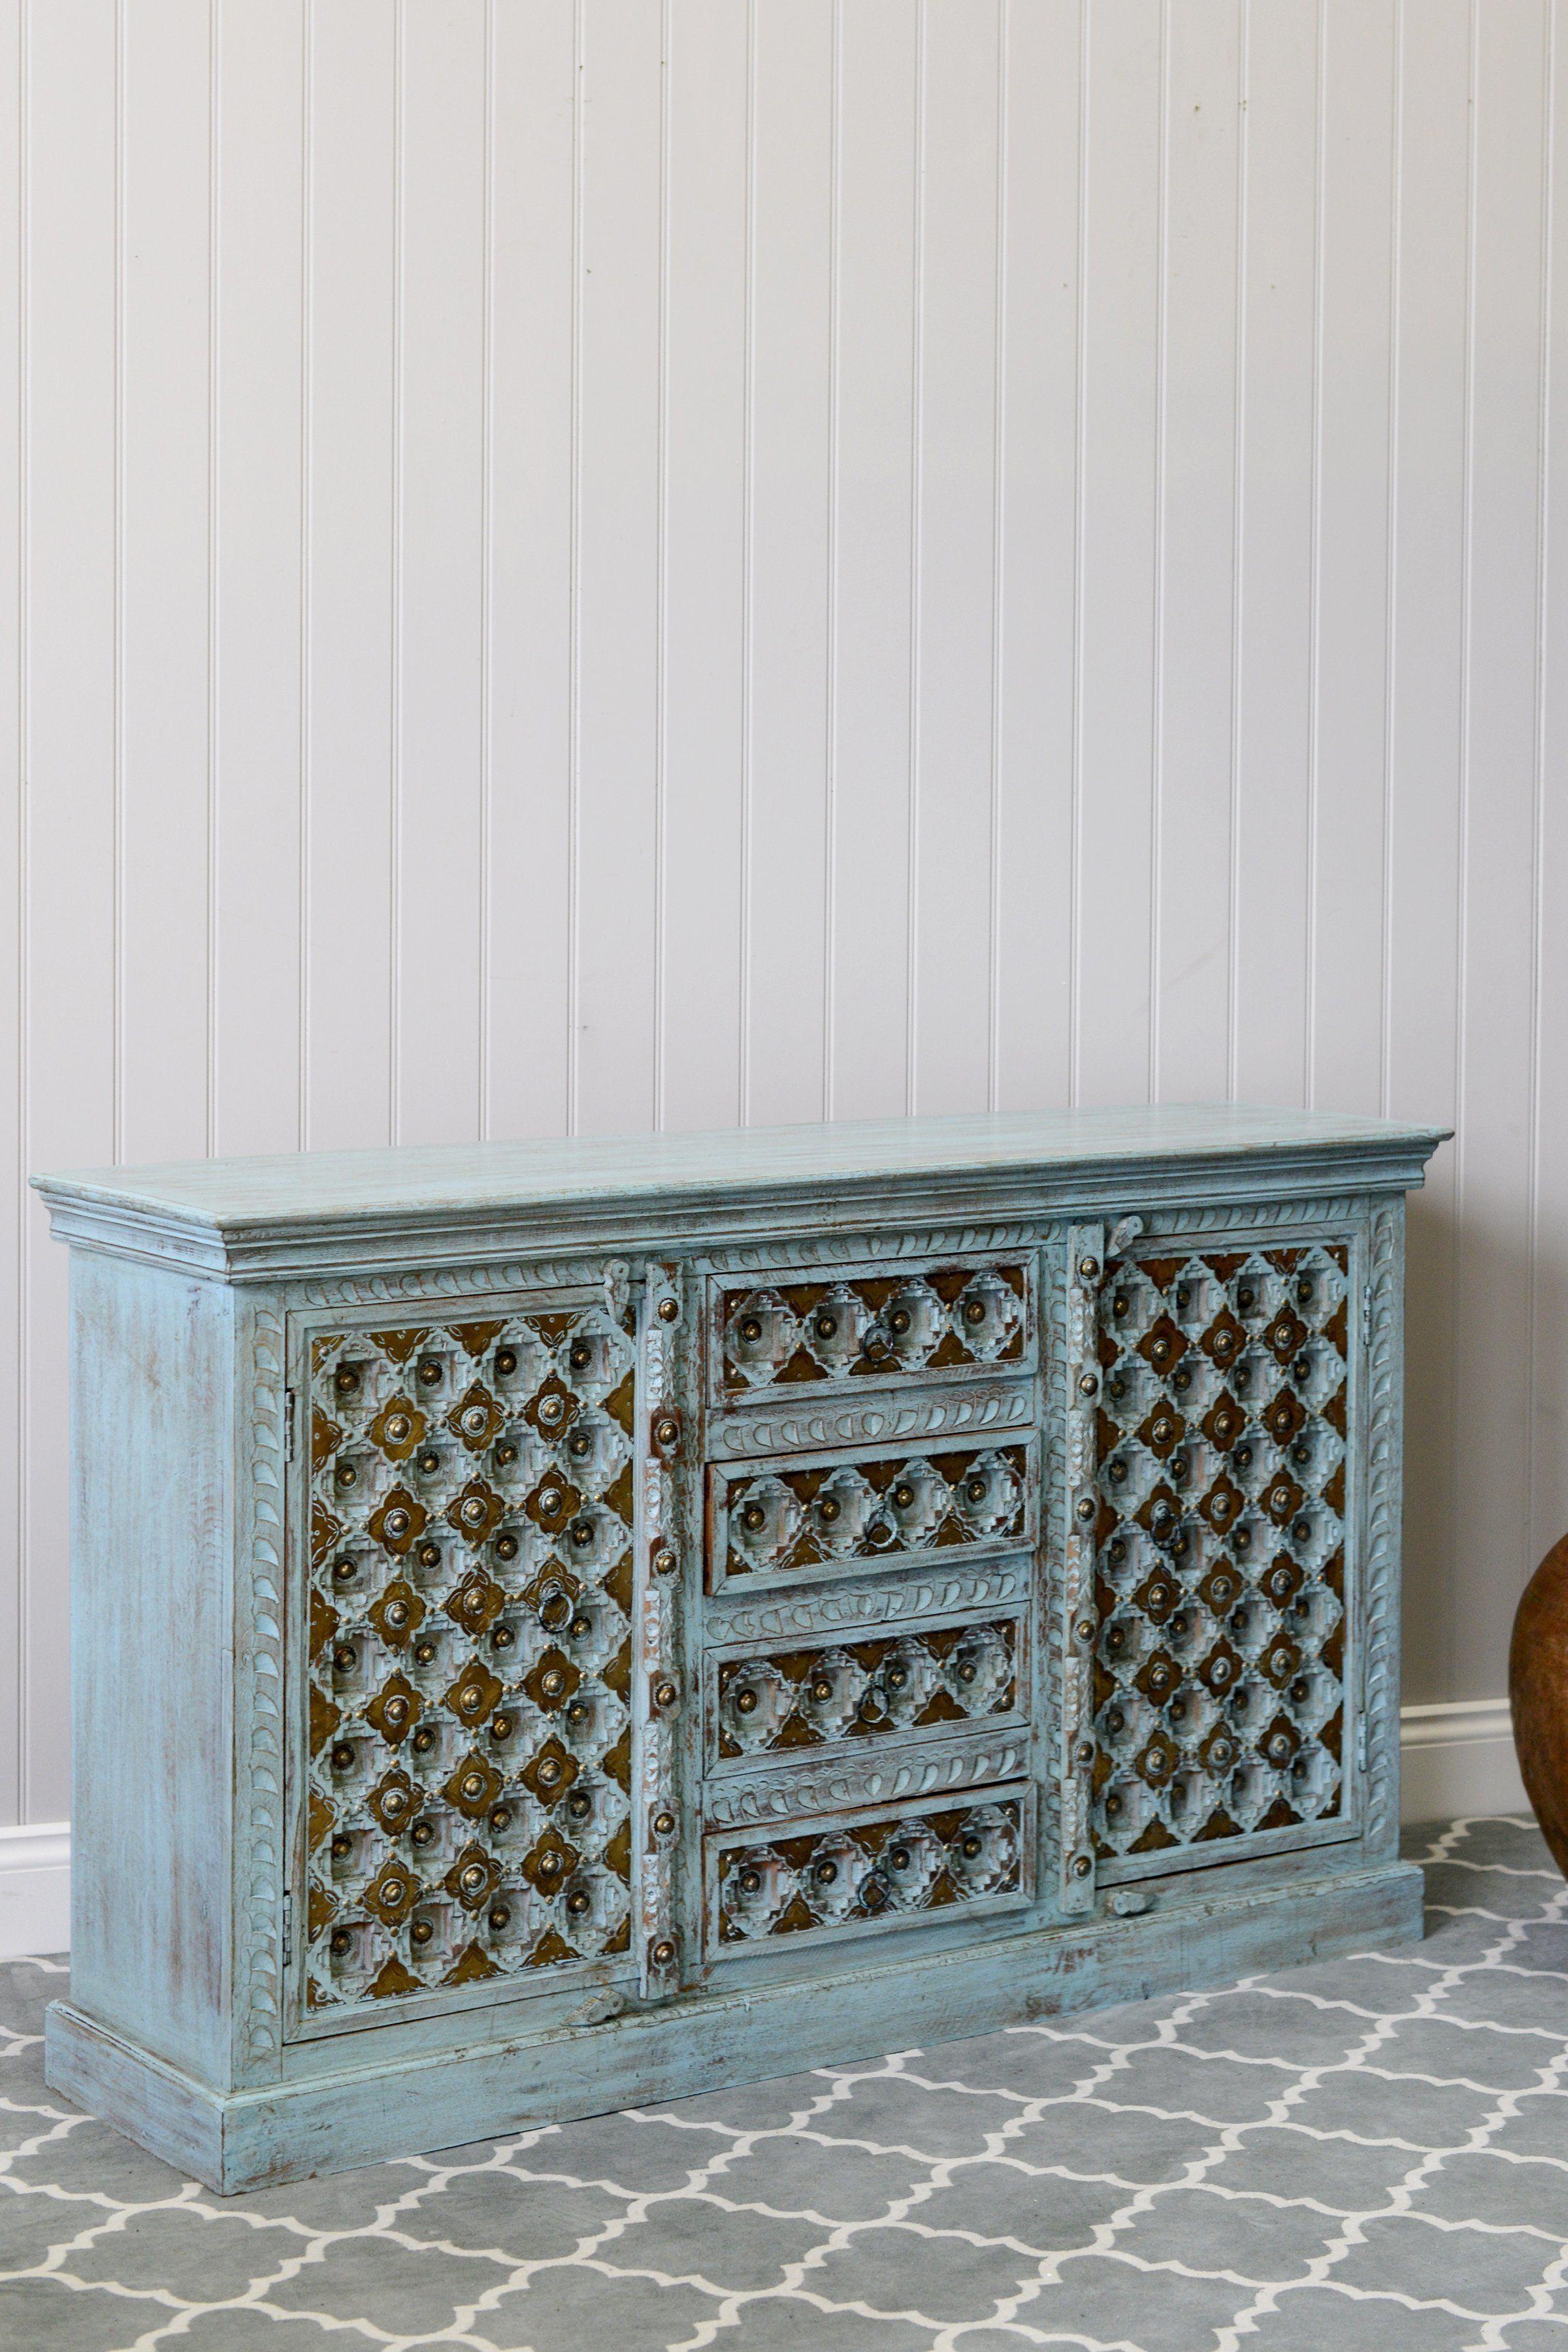 Vintage Pale Blue Wooden Sideboard   Vinterior.co   Interior regarding Alkmene Sideboards (Image 28 of 30)